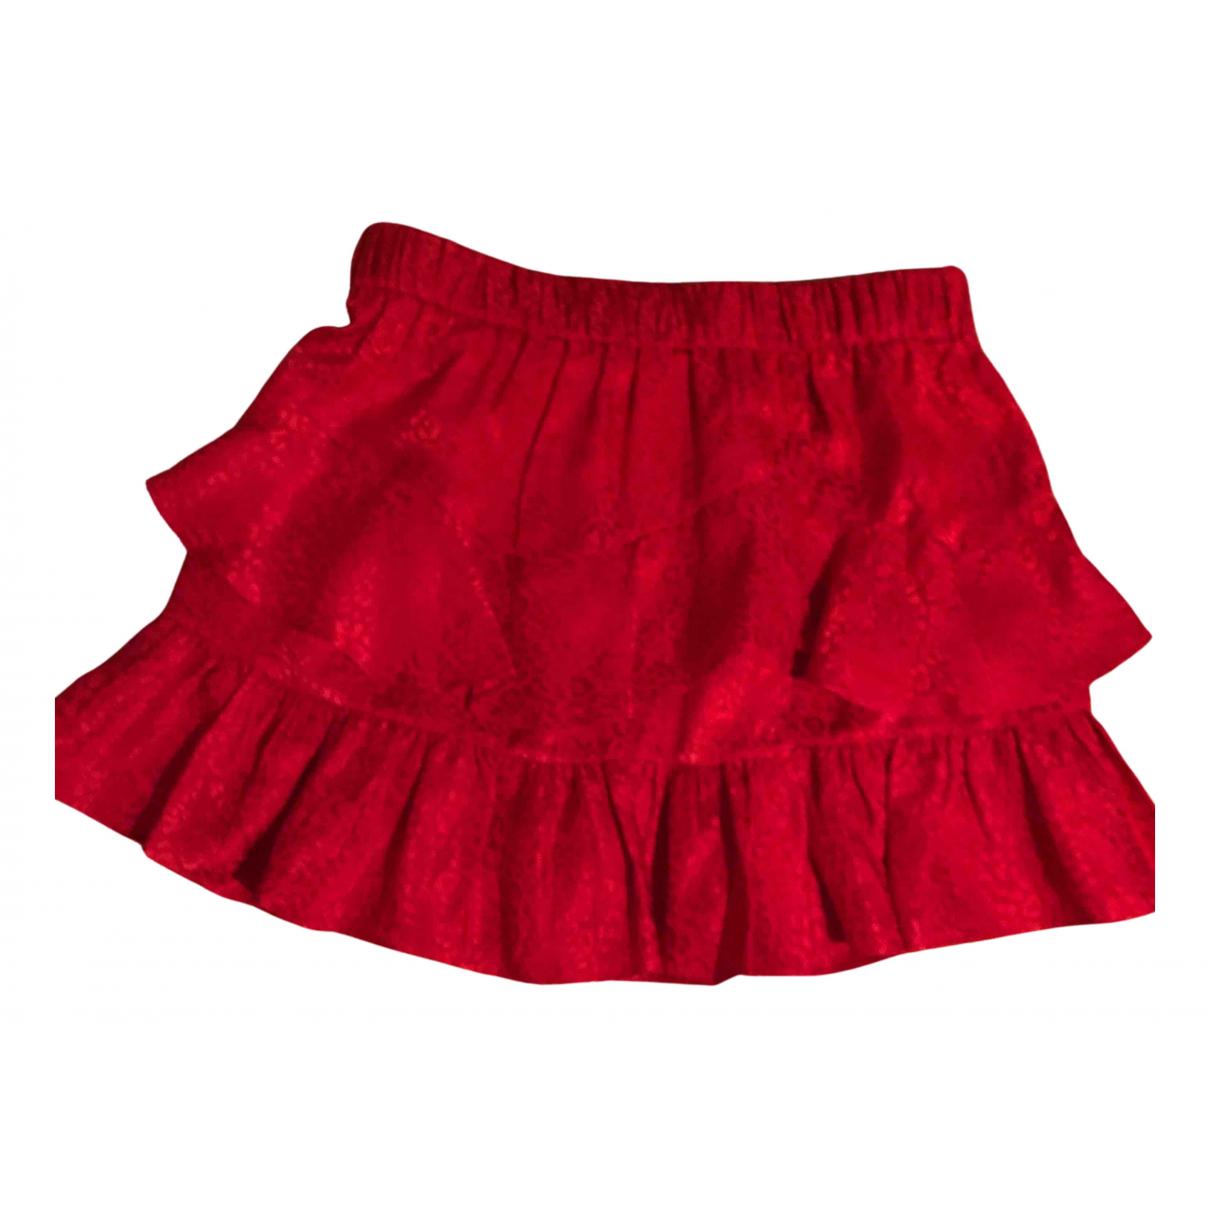 Iro - Jupe Spring Summer 2019 pour femme en soie - rouge